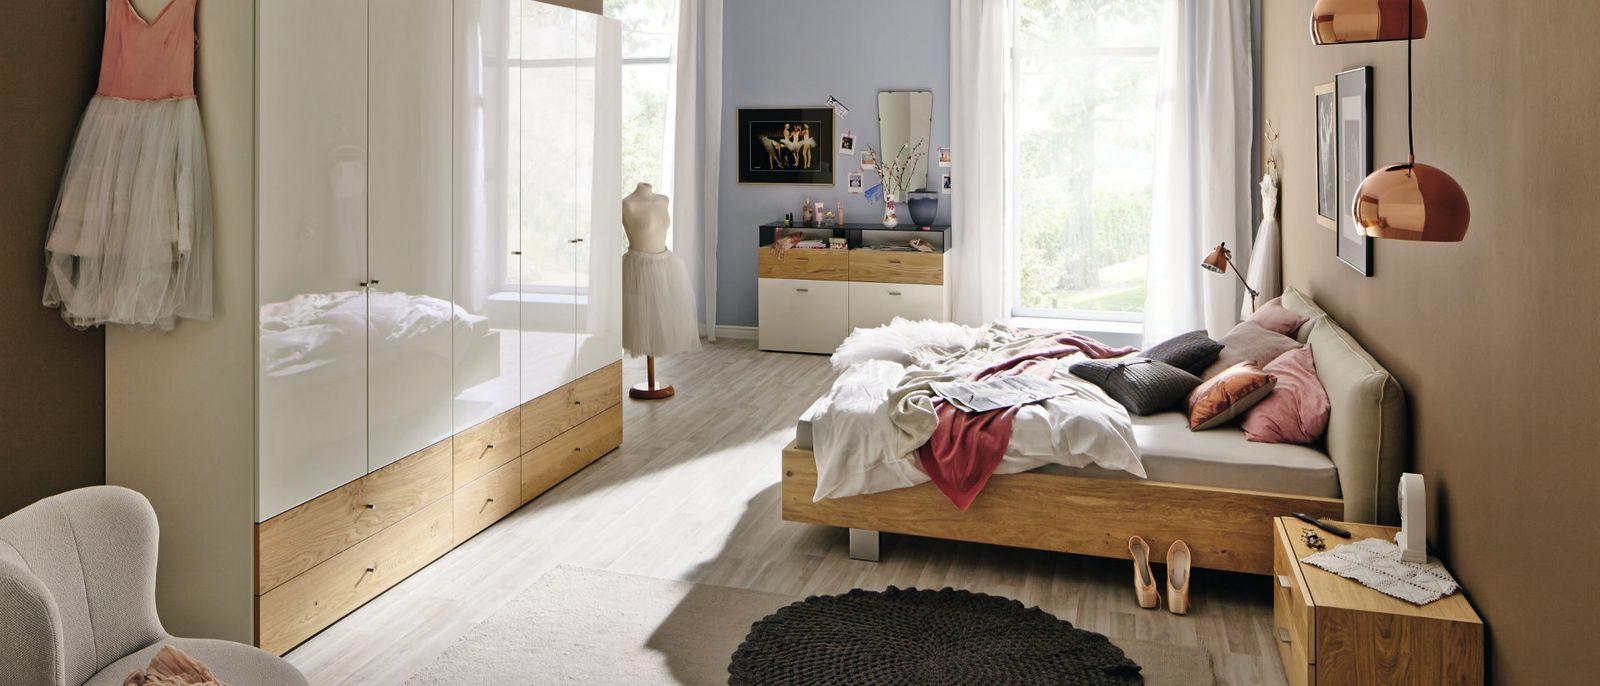 Sleeping: Hülsta   Die Möbelmarke